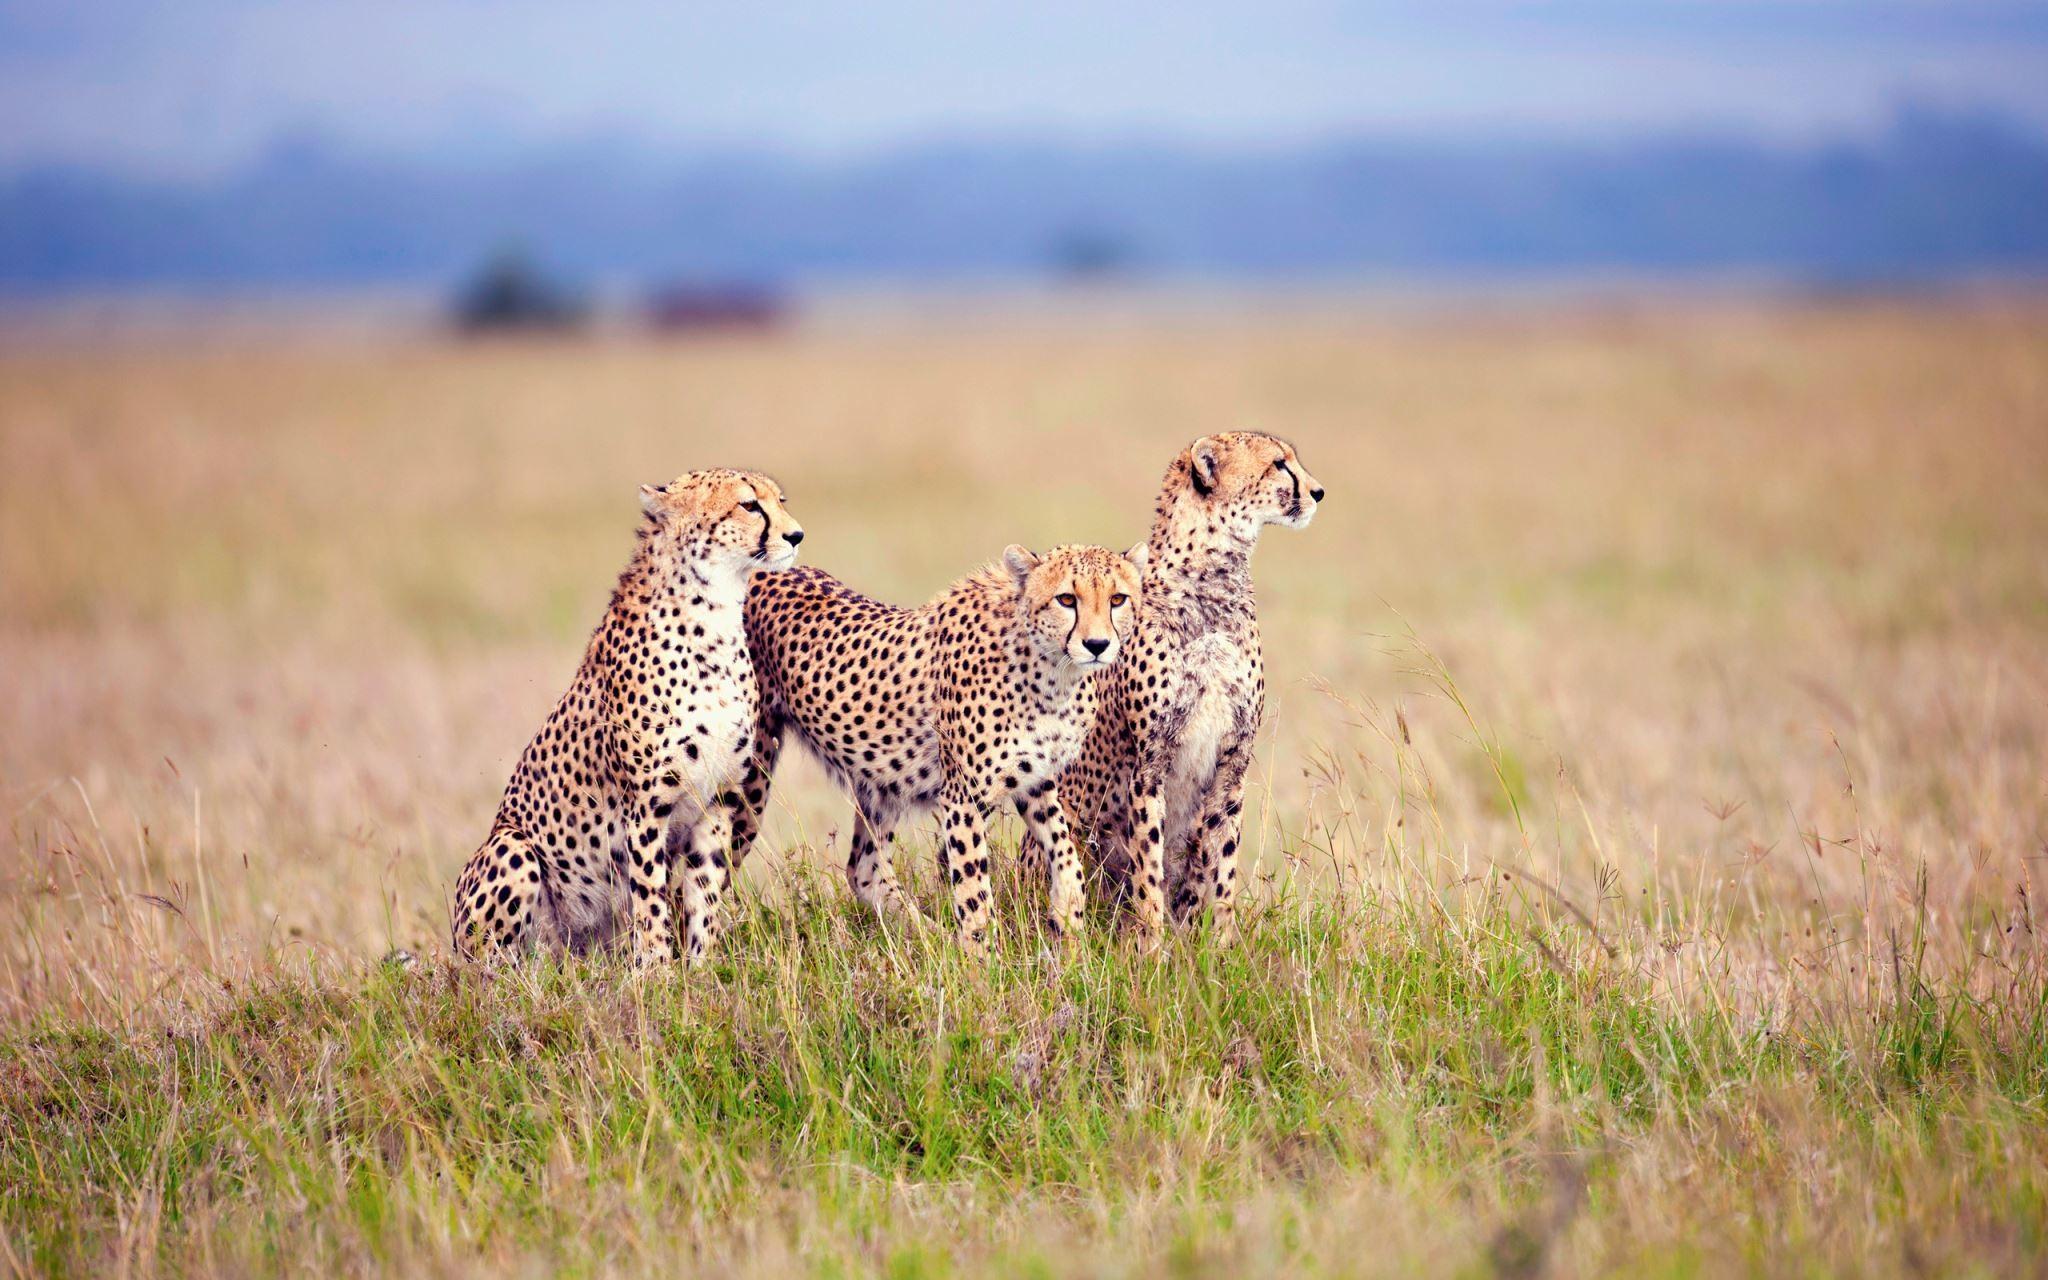 Res: 2048x1280, Cheetah animals Photos Gallery